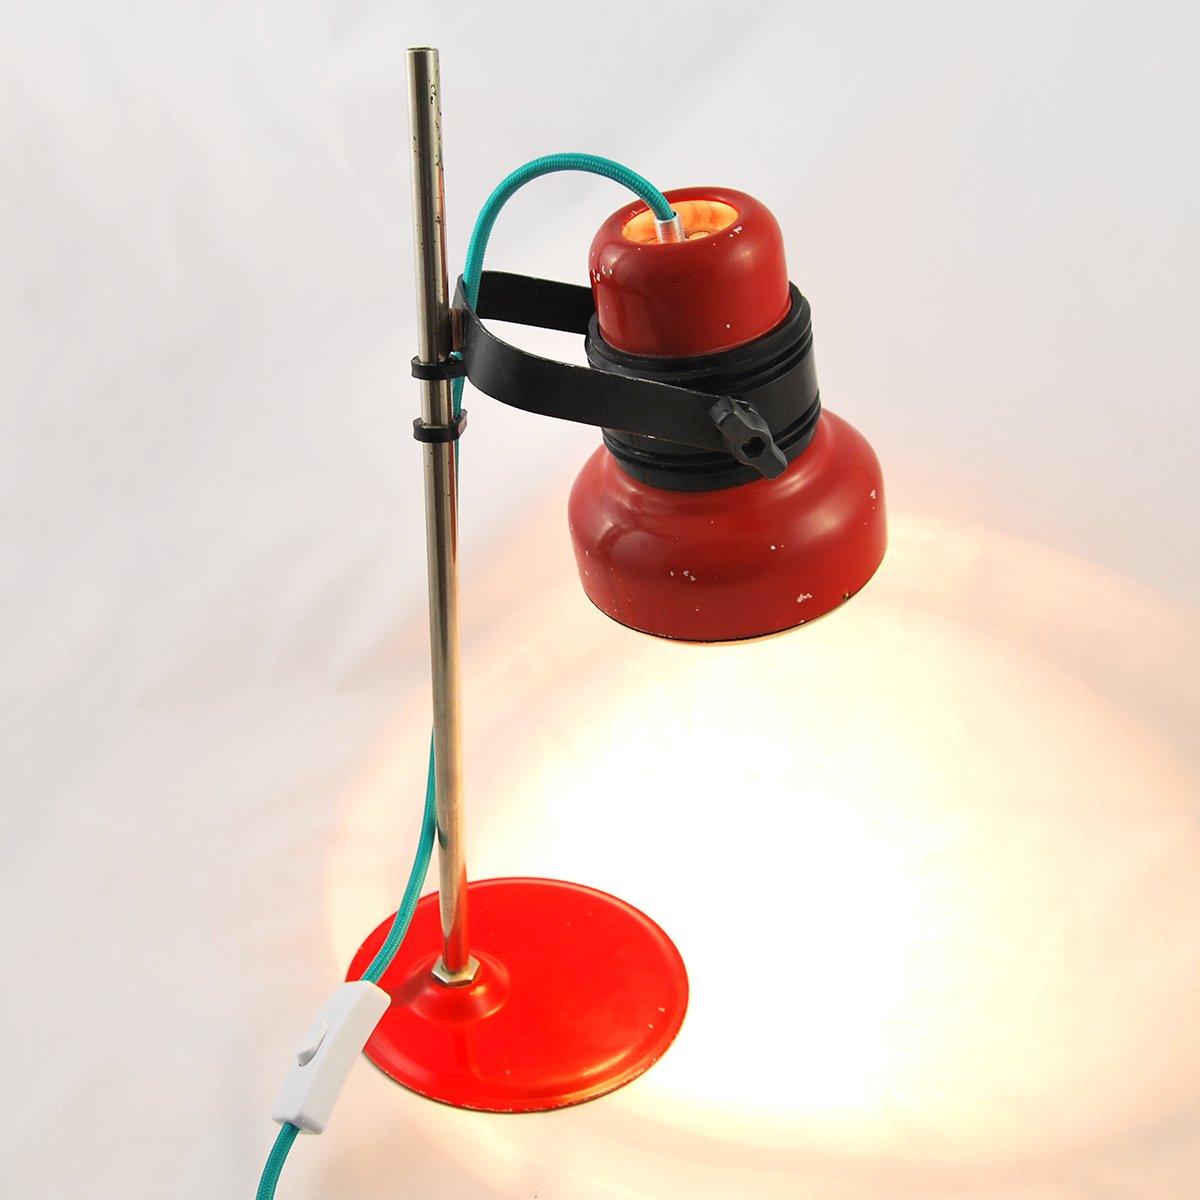 lampe de bureau rouge mod le he 4380 de elektrofem 1970s en vente sur pamono. Black Bedroom Furniture Sets. Home Design Ideas